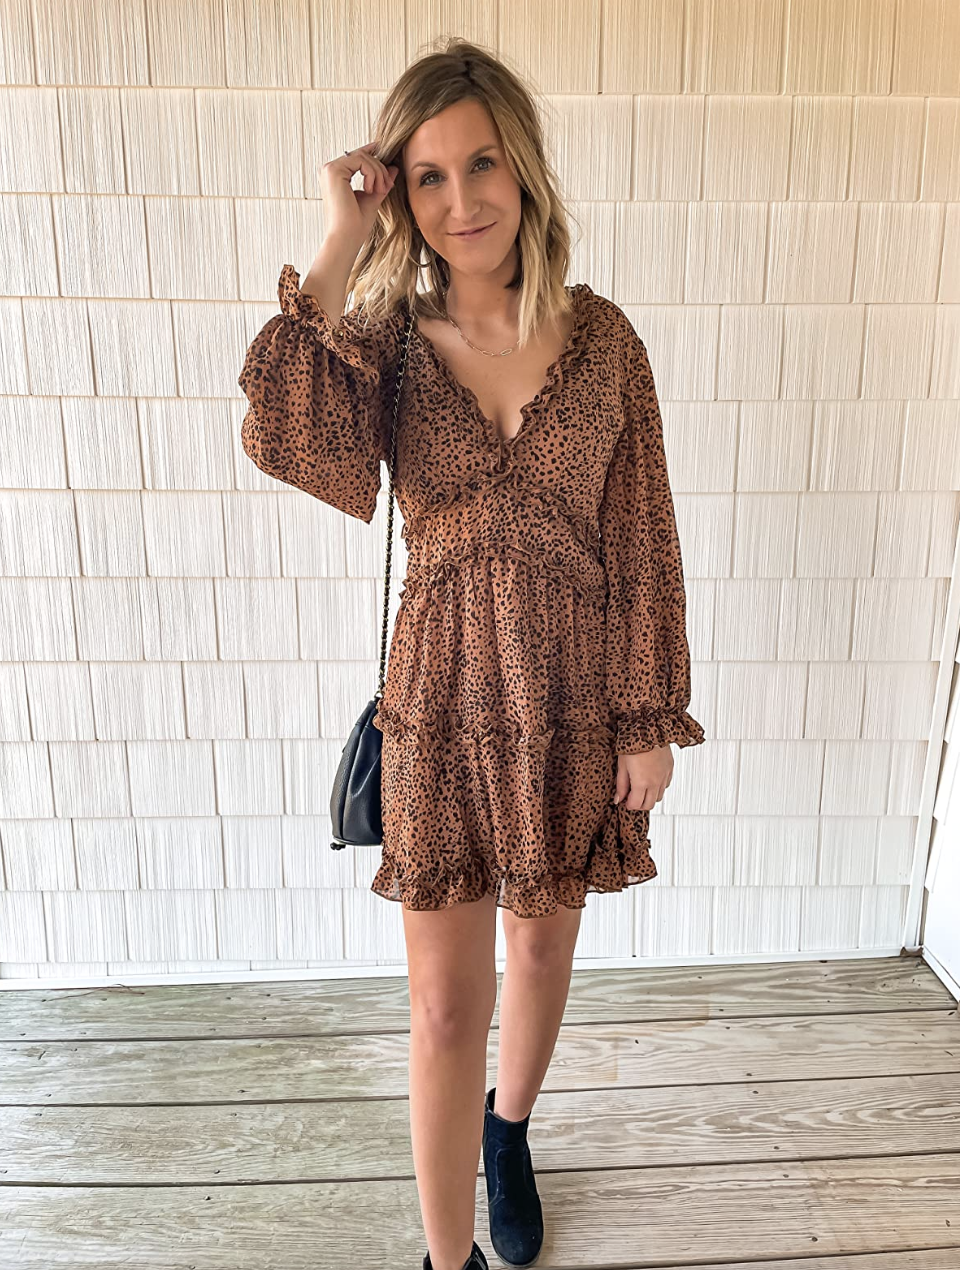 reviewer wearing the leopard dress